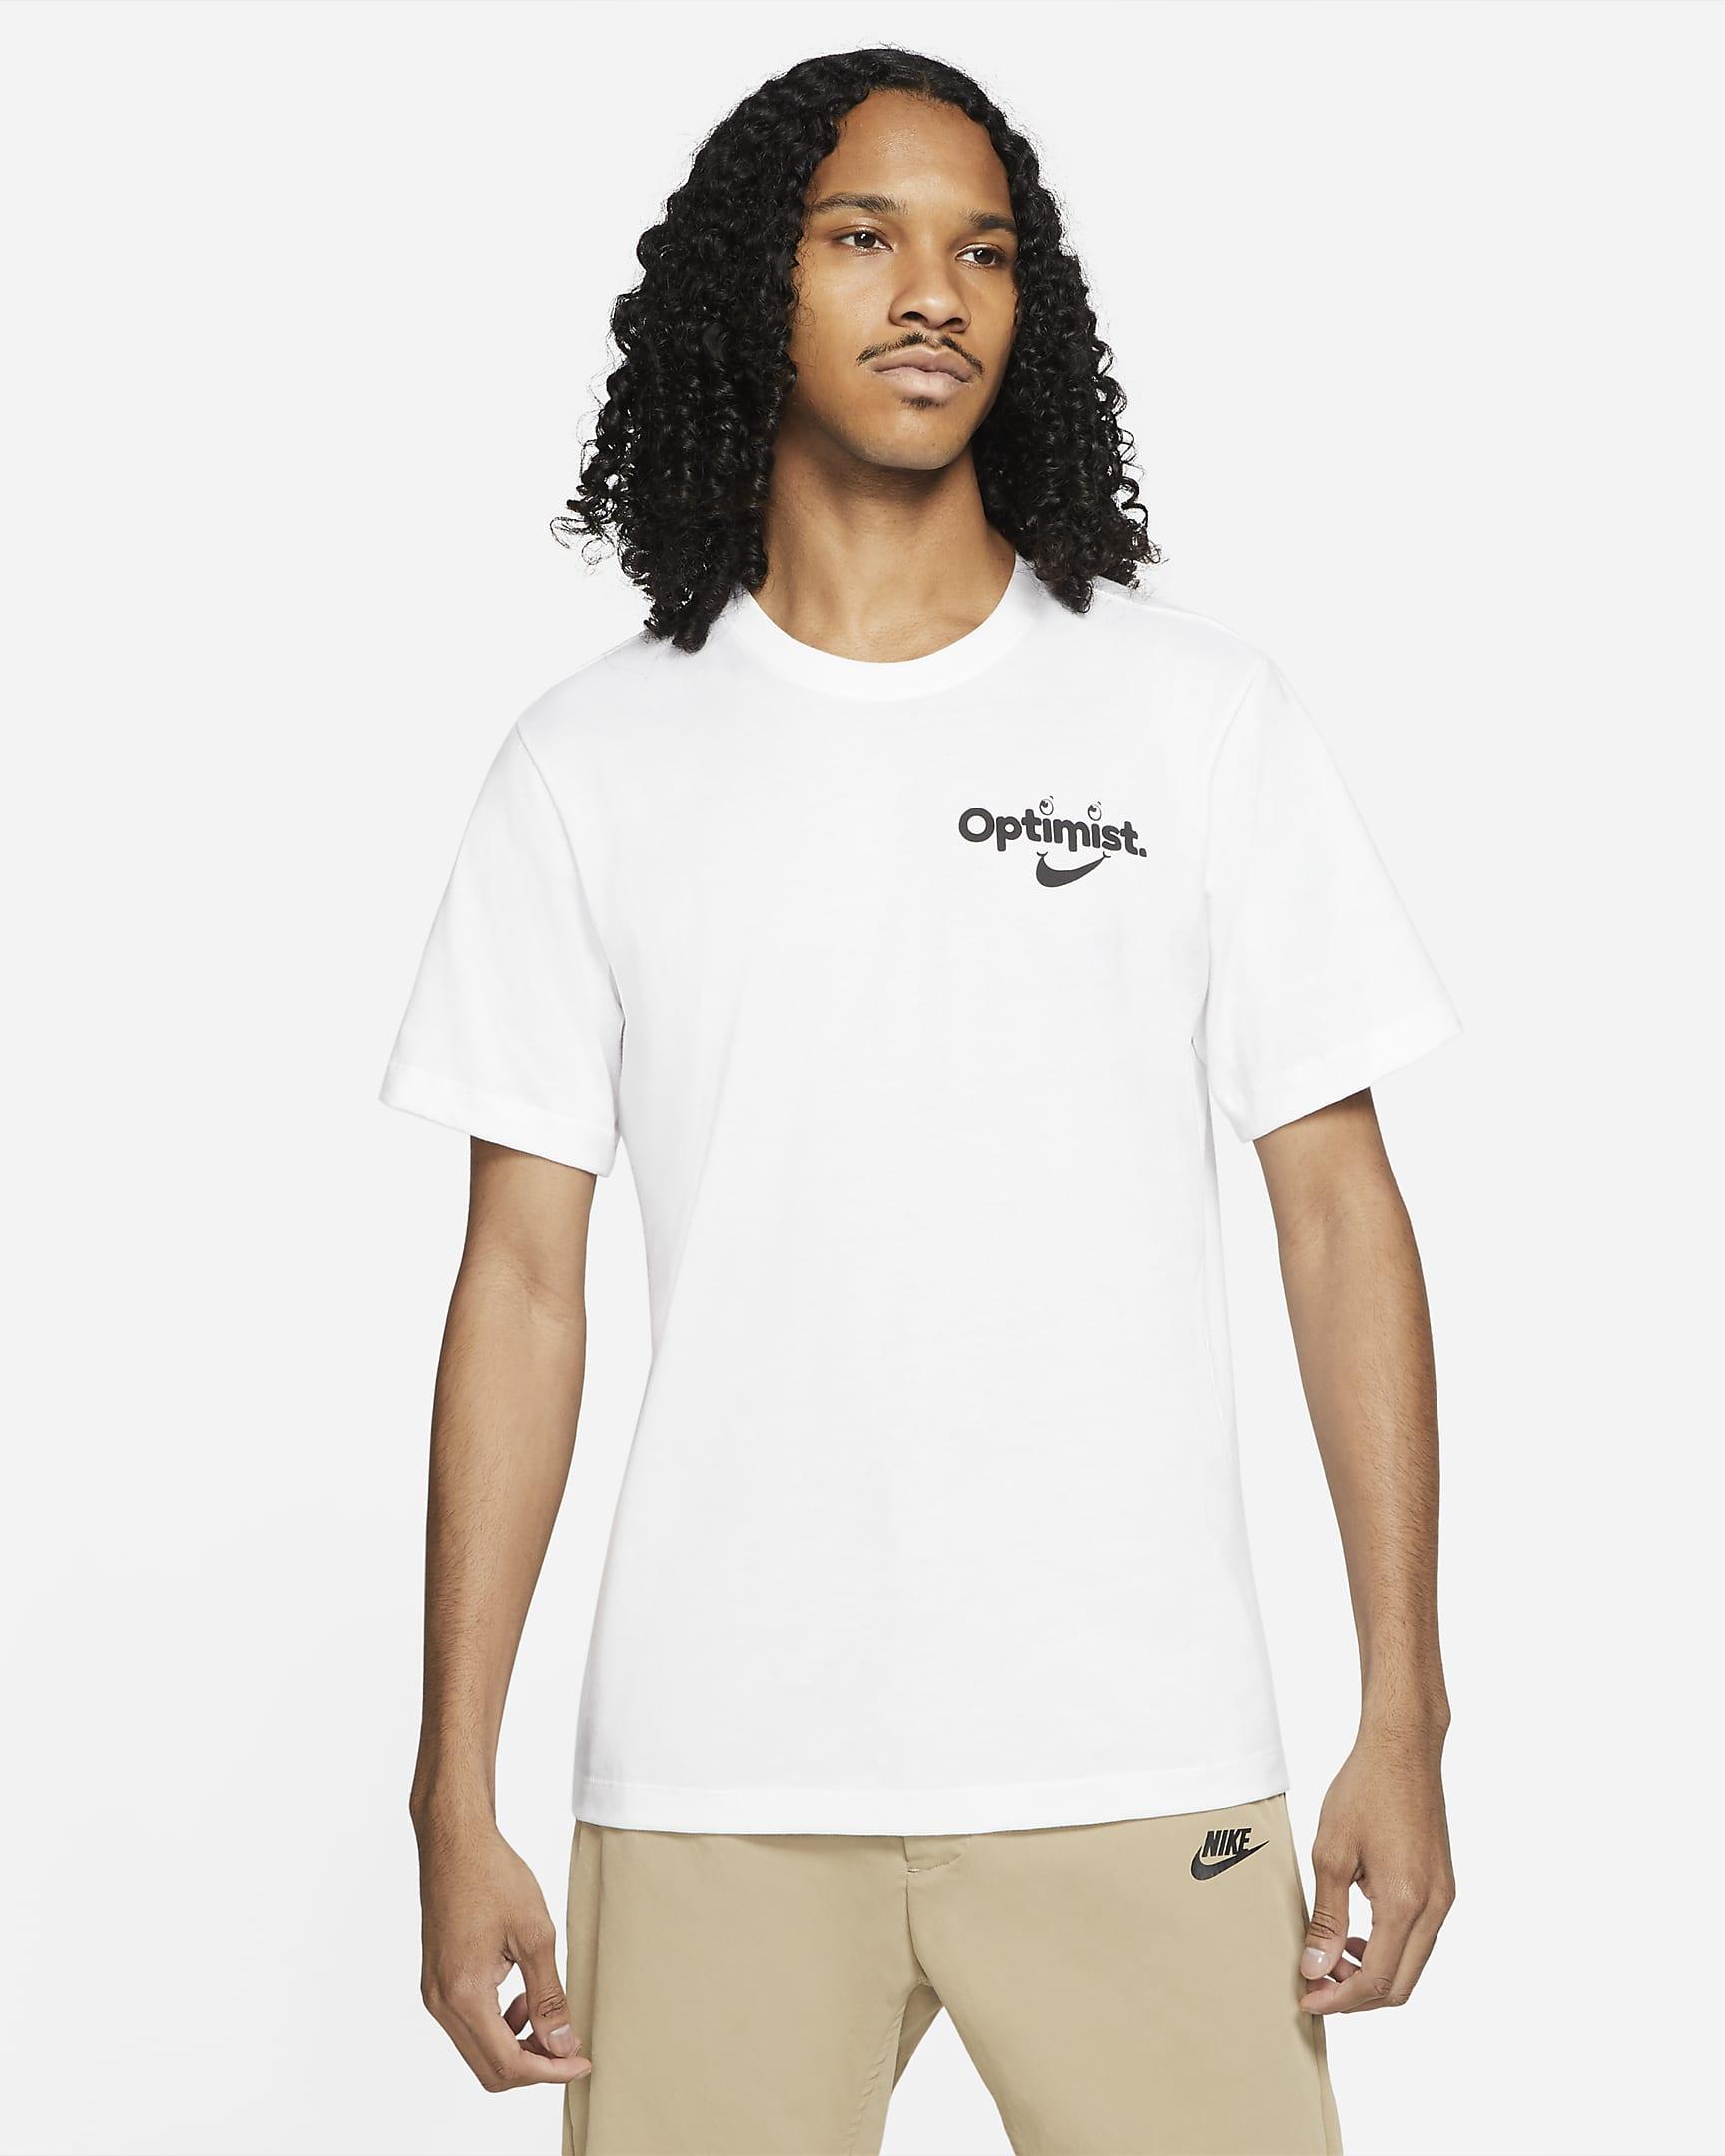 sportswear-mens-t-shirt-VfLpRj